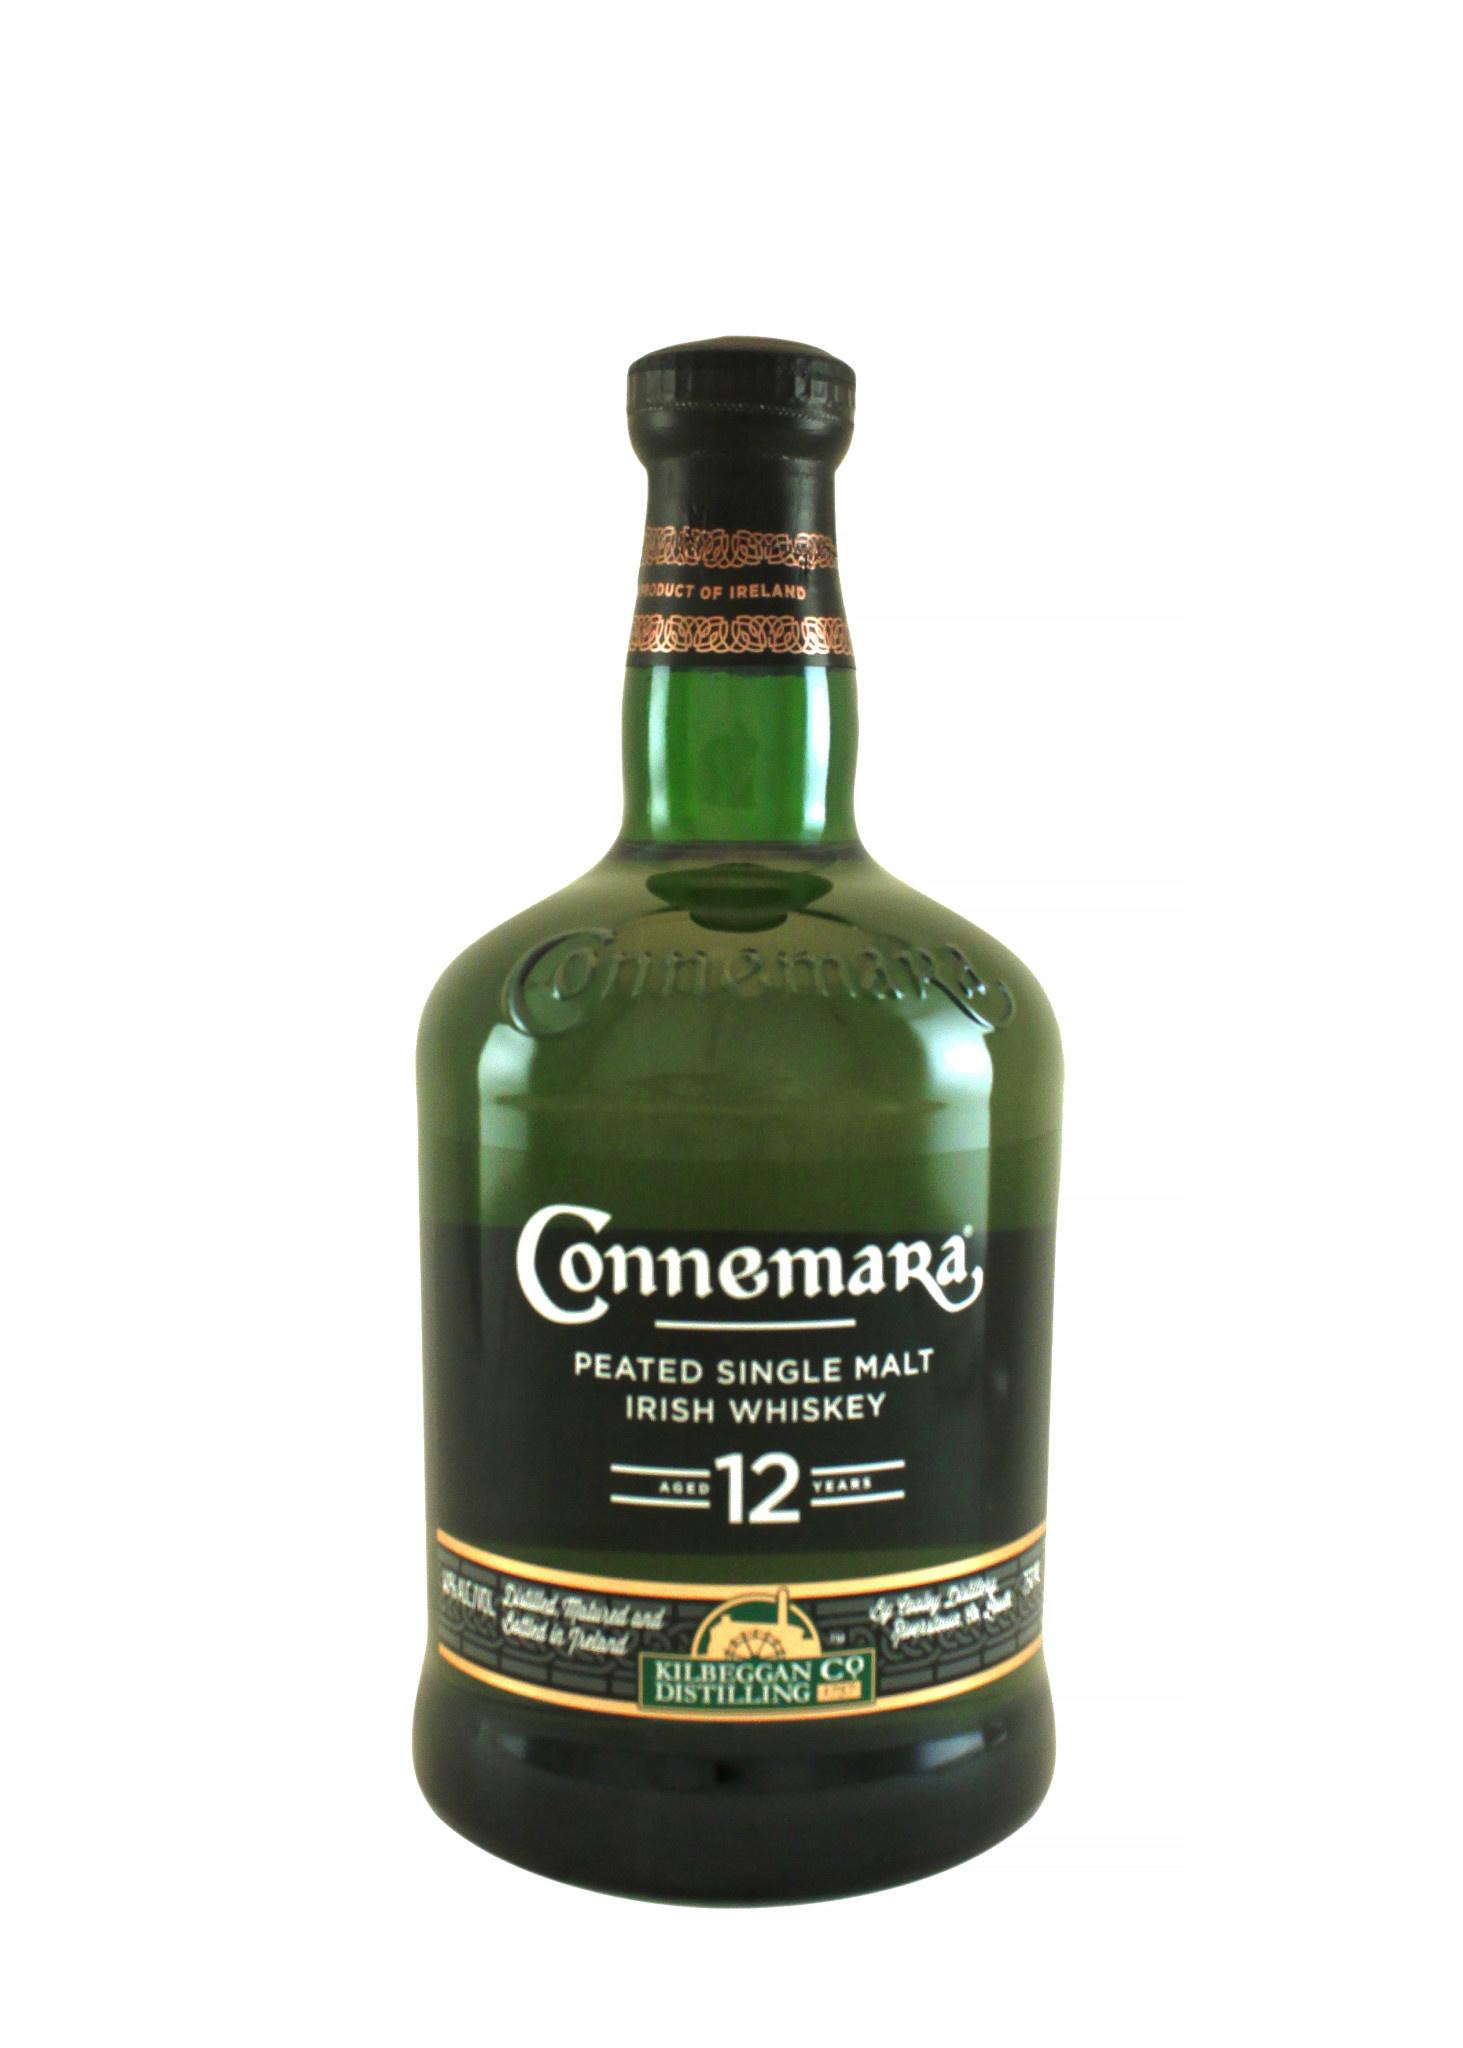 Connemara Peated Single Malt Irish Whiskey Aged 12 Years, Cooley Peninsula, Ireland